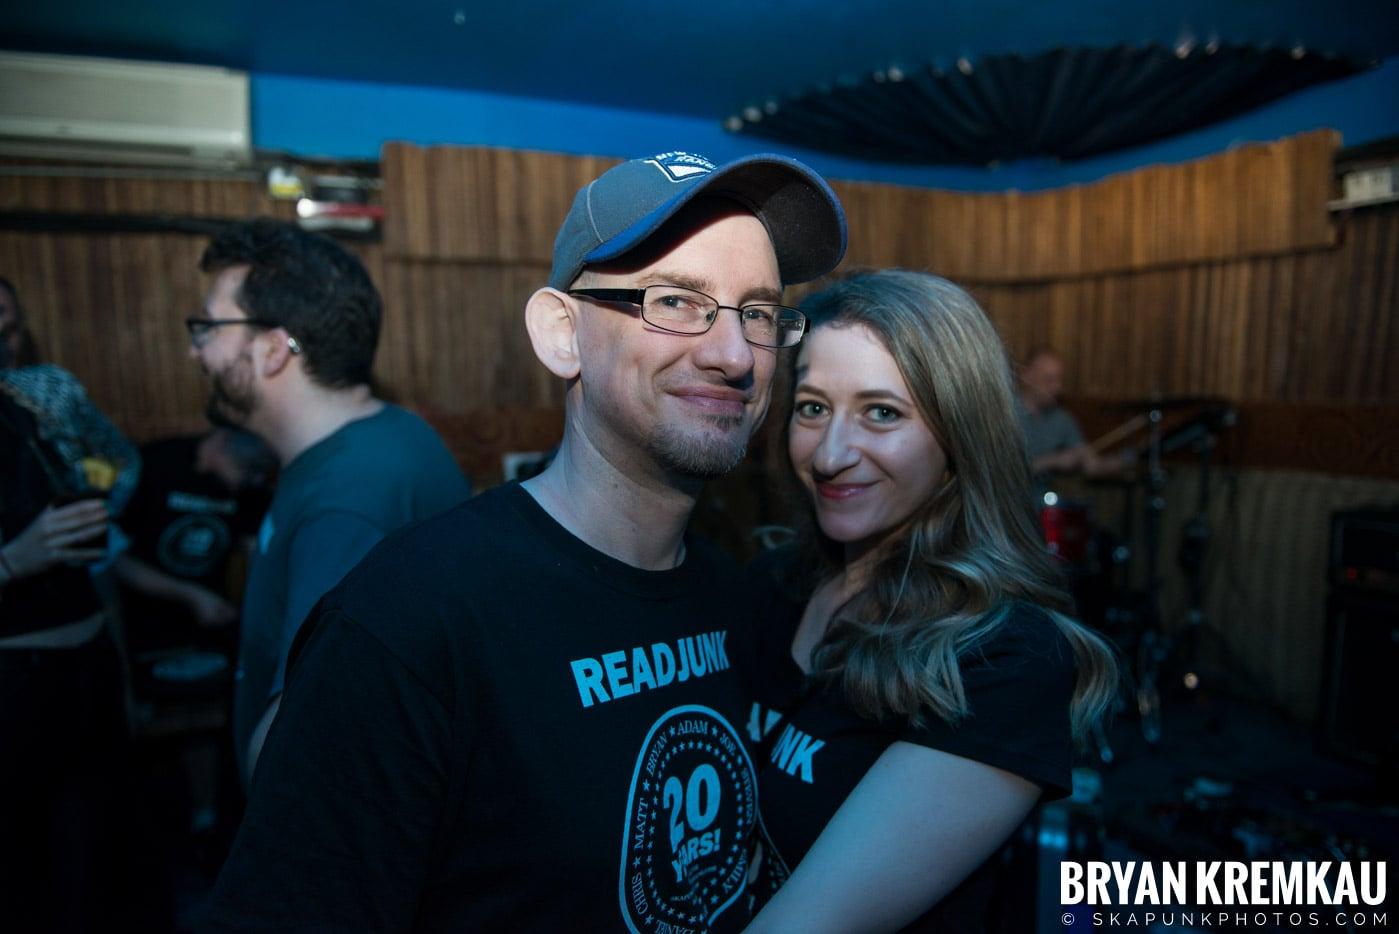 ReadJunk.com 20th Anniversary Party @ Otto's Shrunken Head, NYC - 4.29.17 (79)